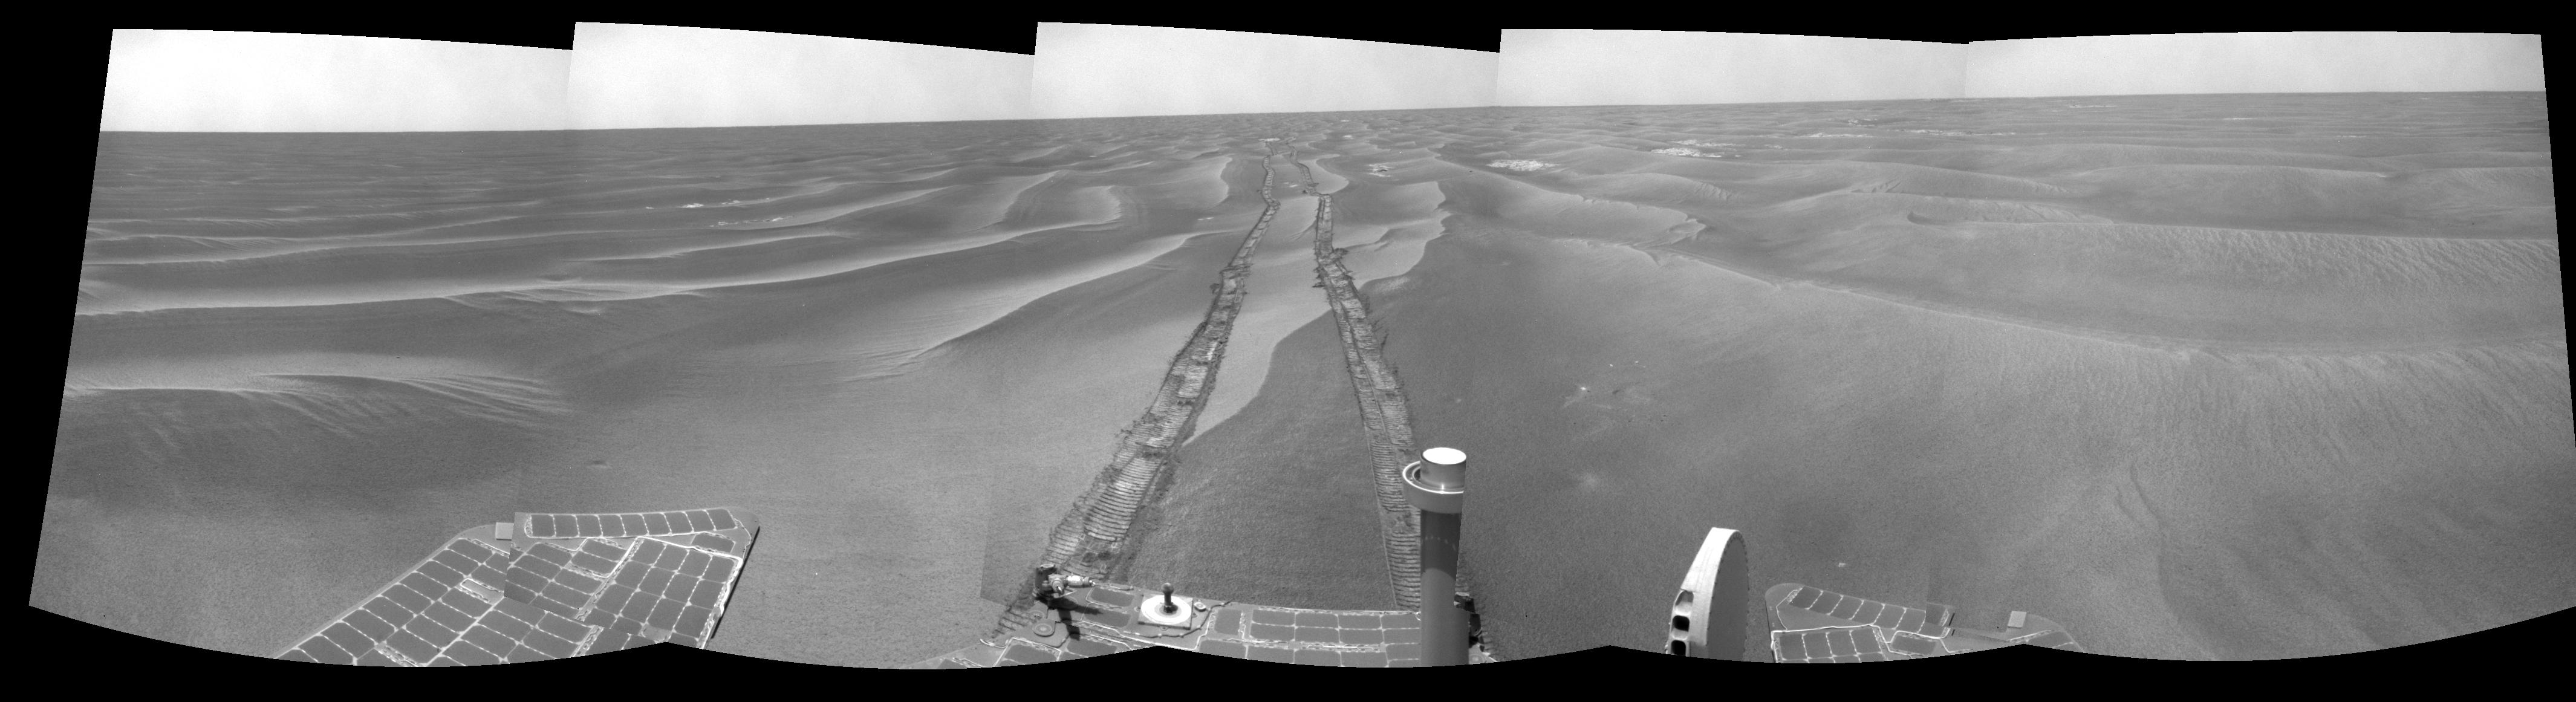 Opportunity's Tracks on Mars - Image credit: NASA/JPL-Caltech